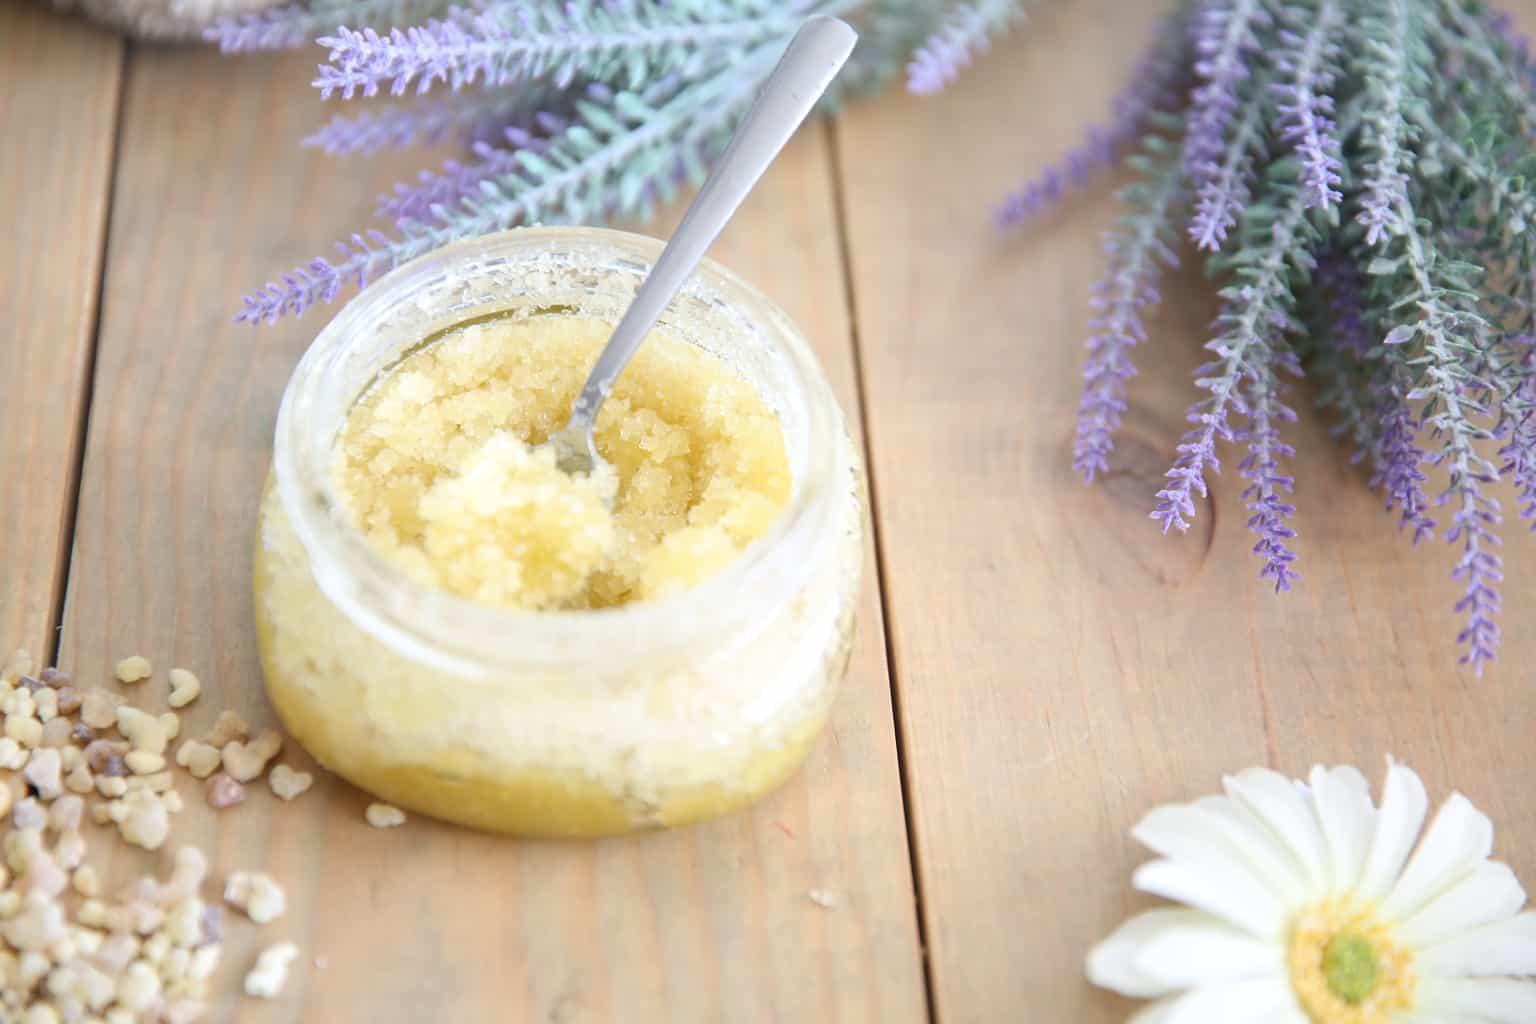 homemade-sugar-scrub-3-1-1